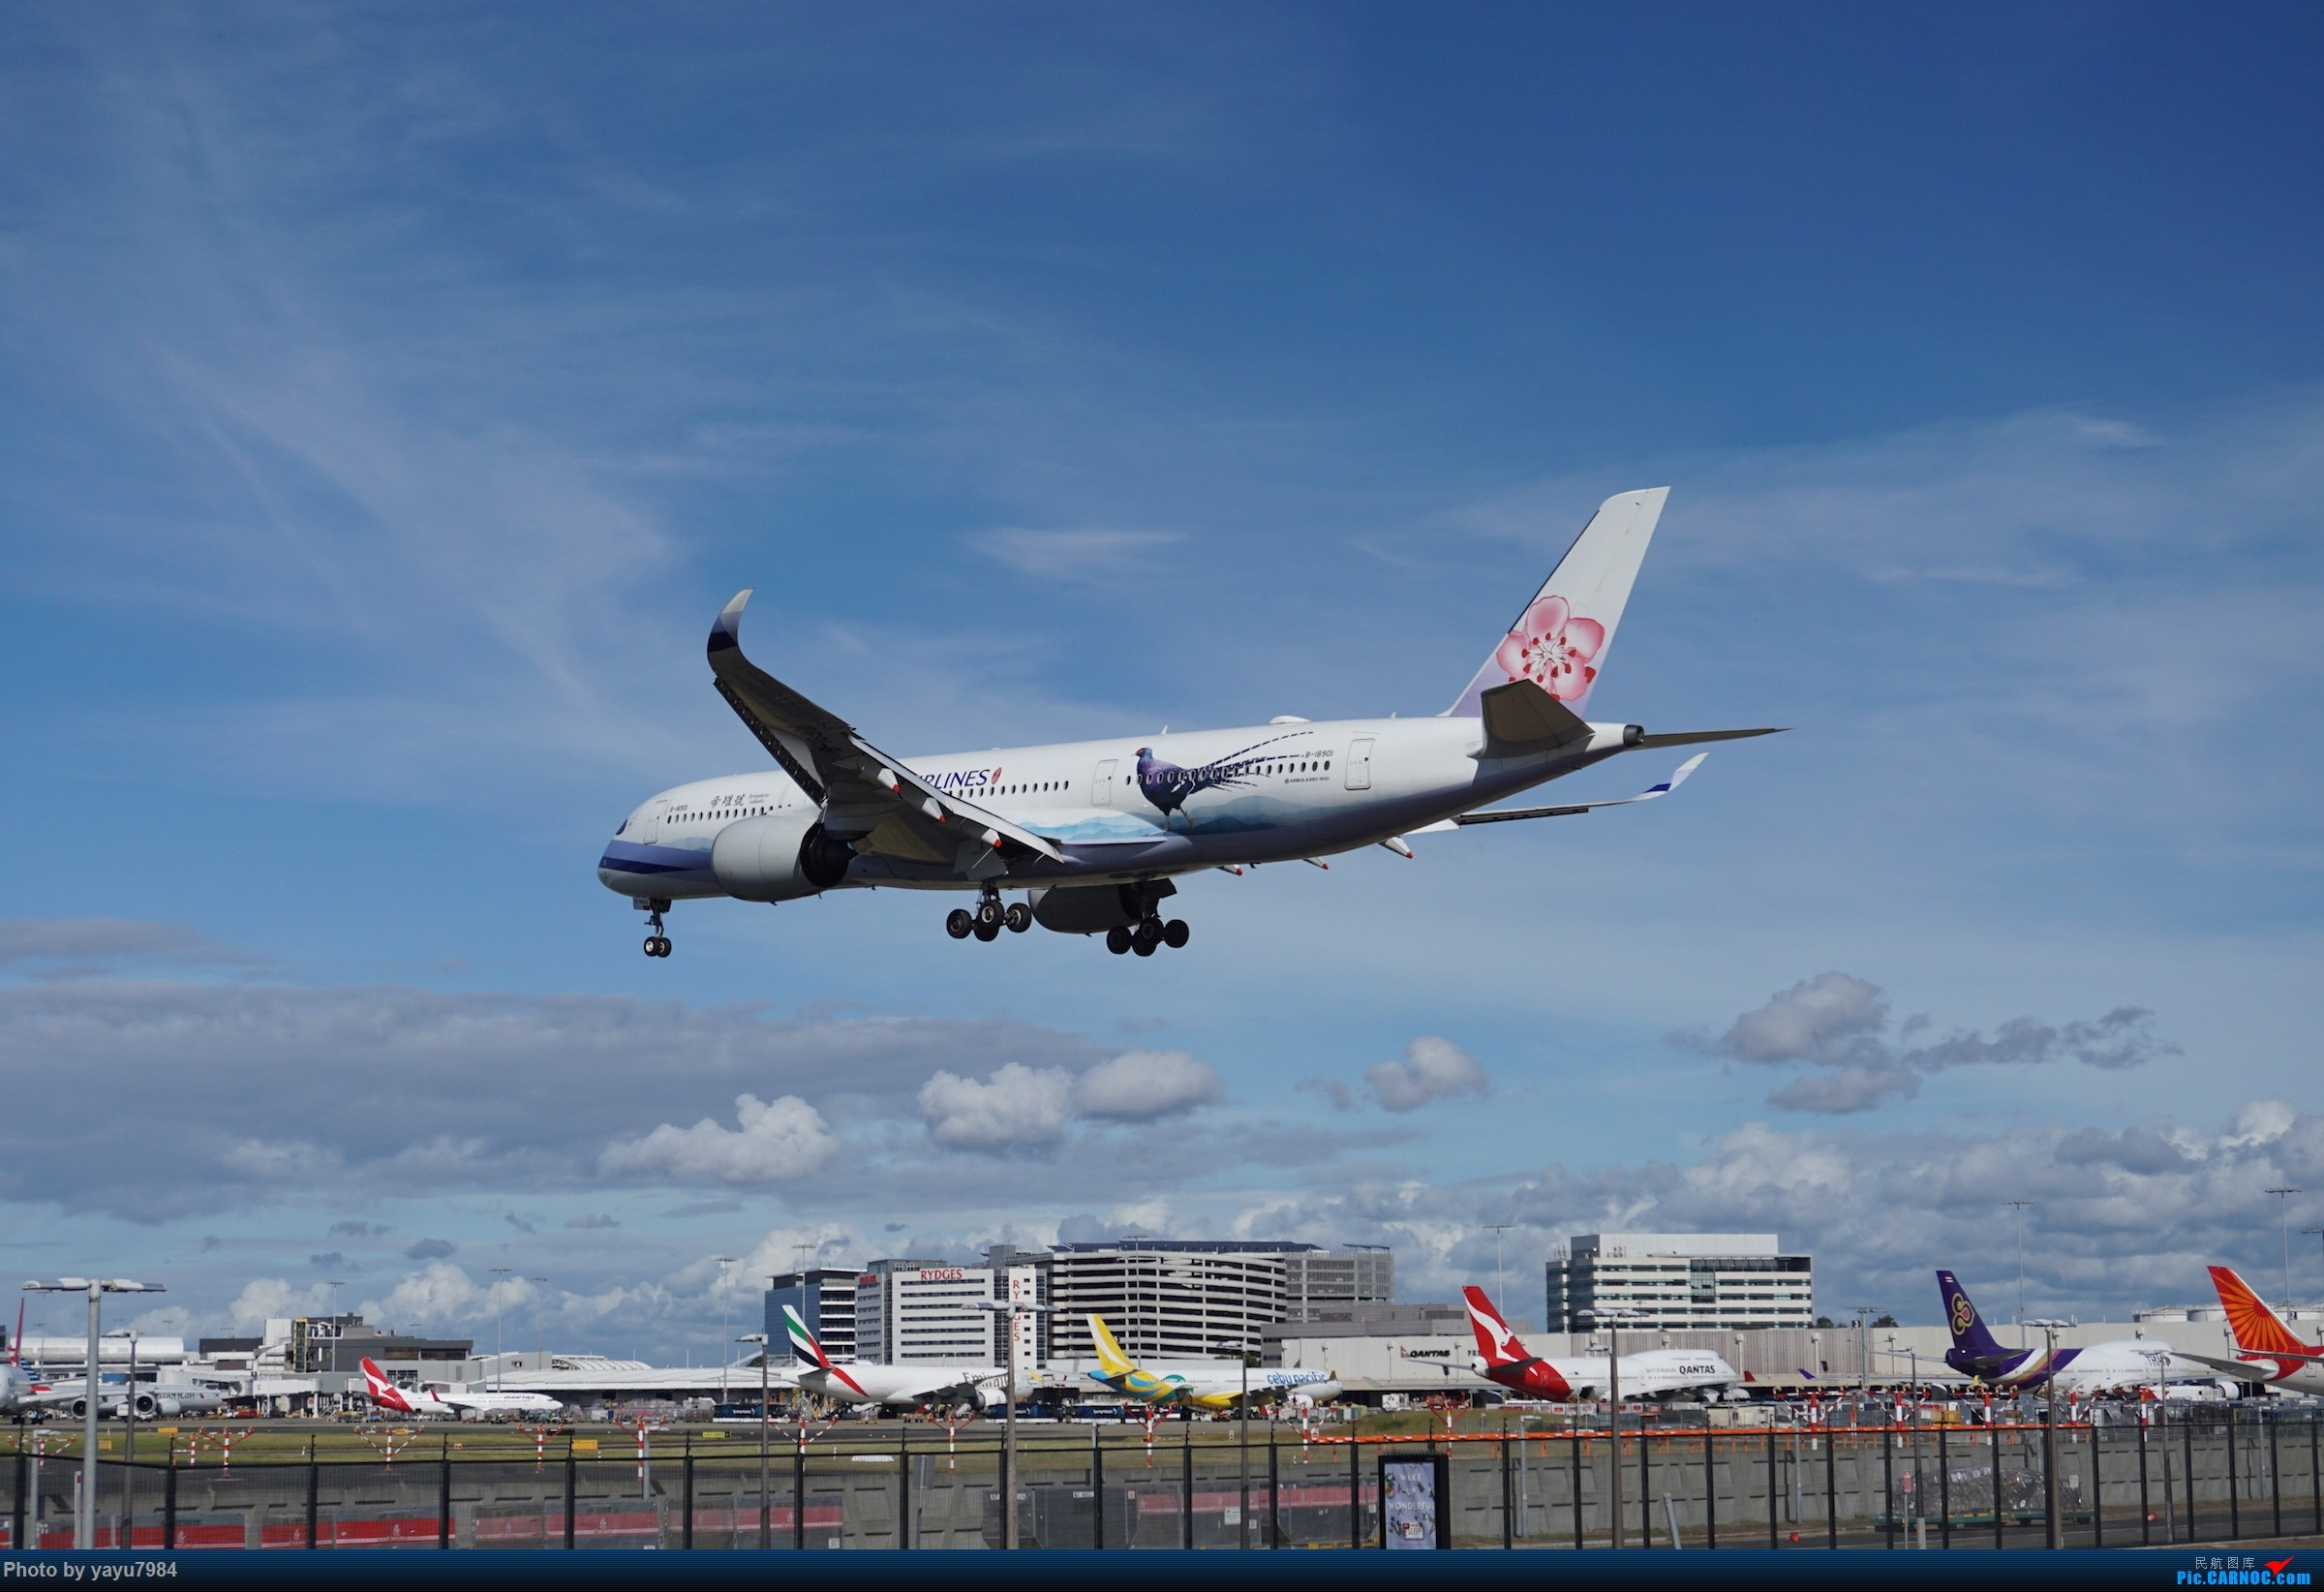 Re:[SYD] 近期随摄,收获颇多 AIRBUS A350-900 B-18901 澳大利亚悉尼金斯福德·史密斯机场